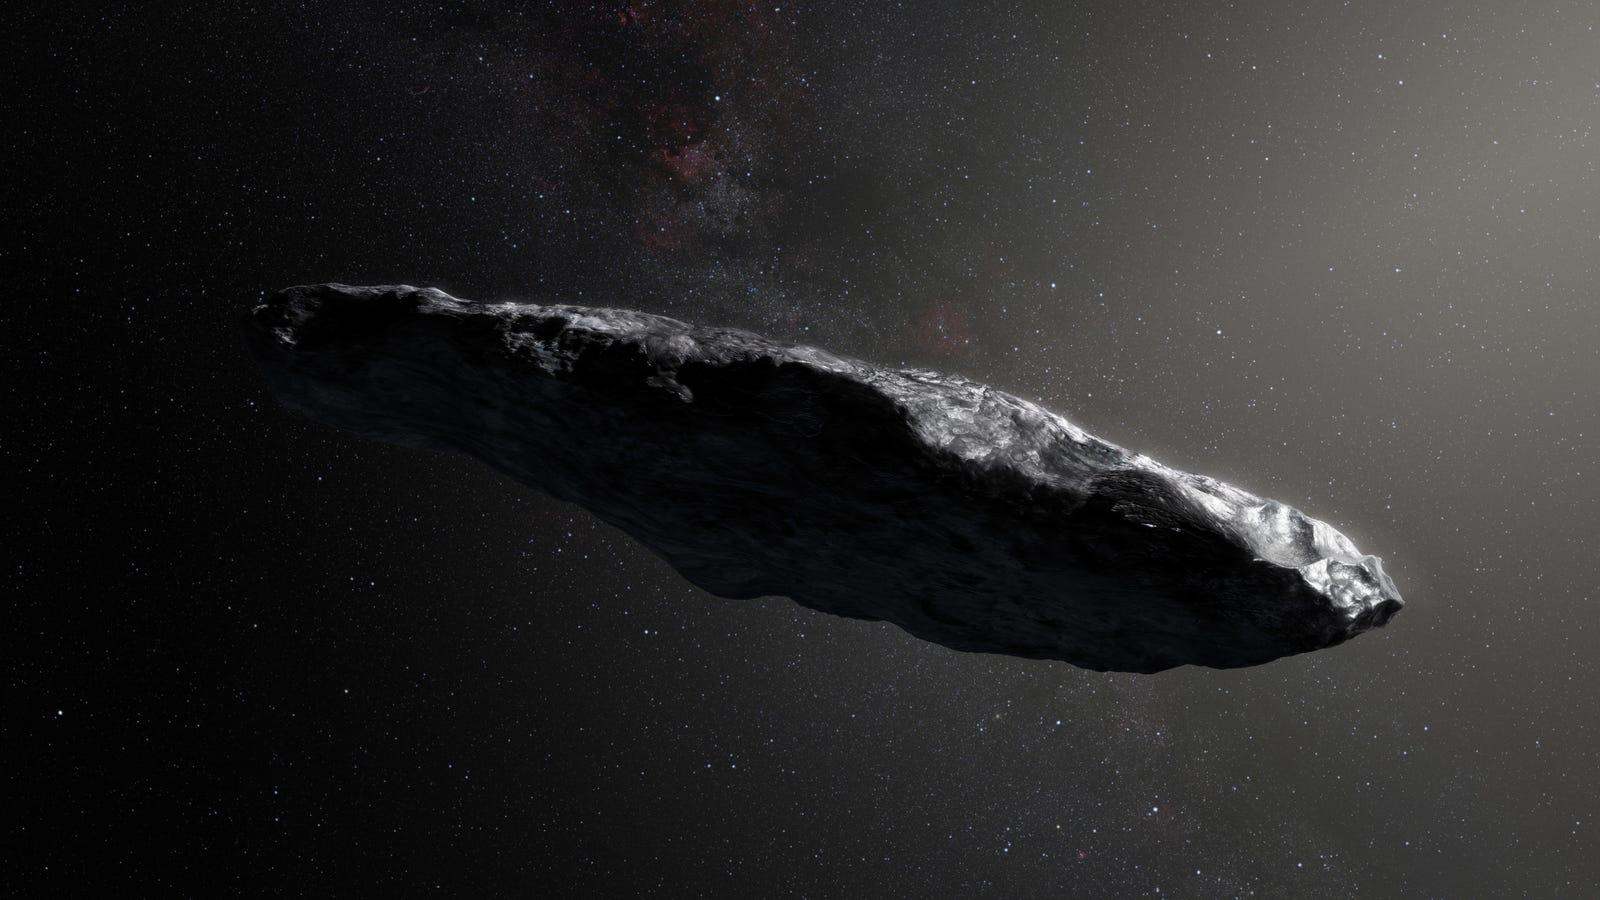 Study Finds Weird Interstellar Object 'Oumuamua Is Indeed a Smol Boi thumbnail